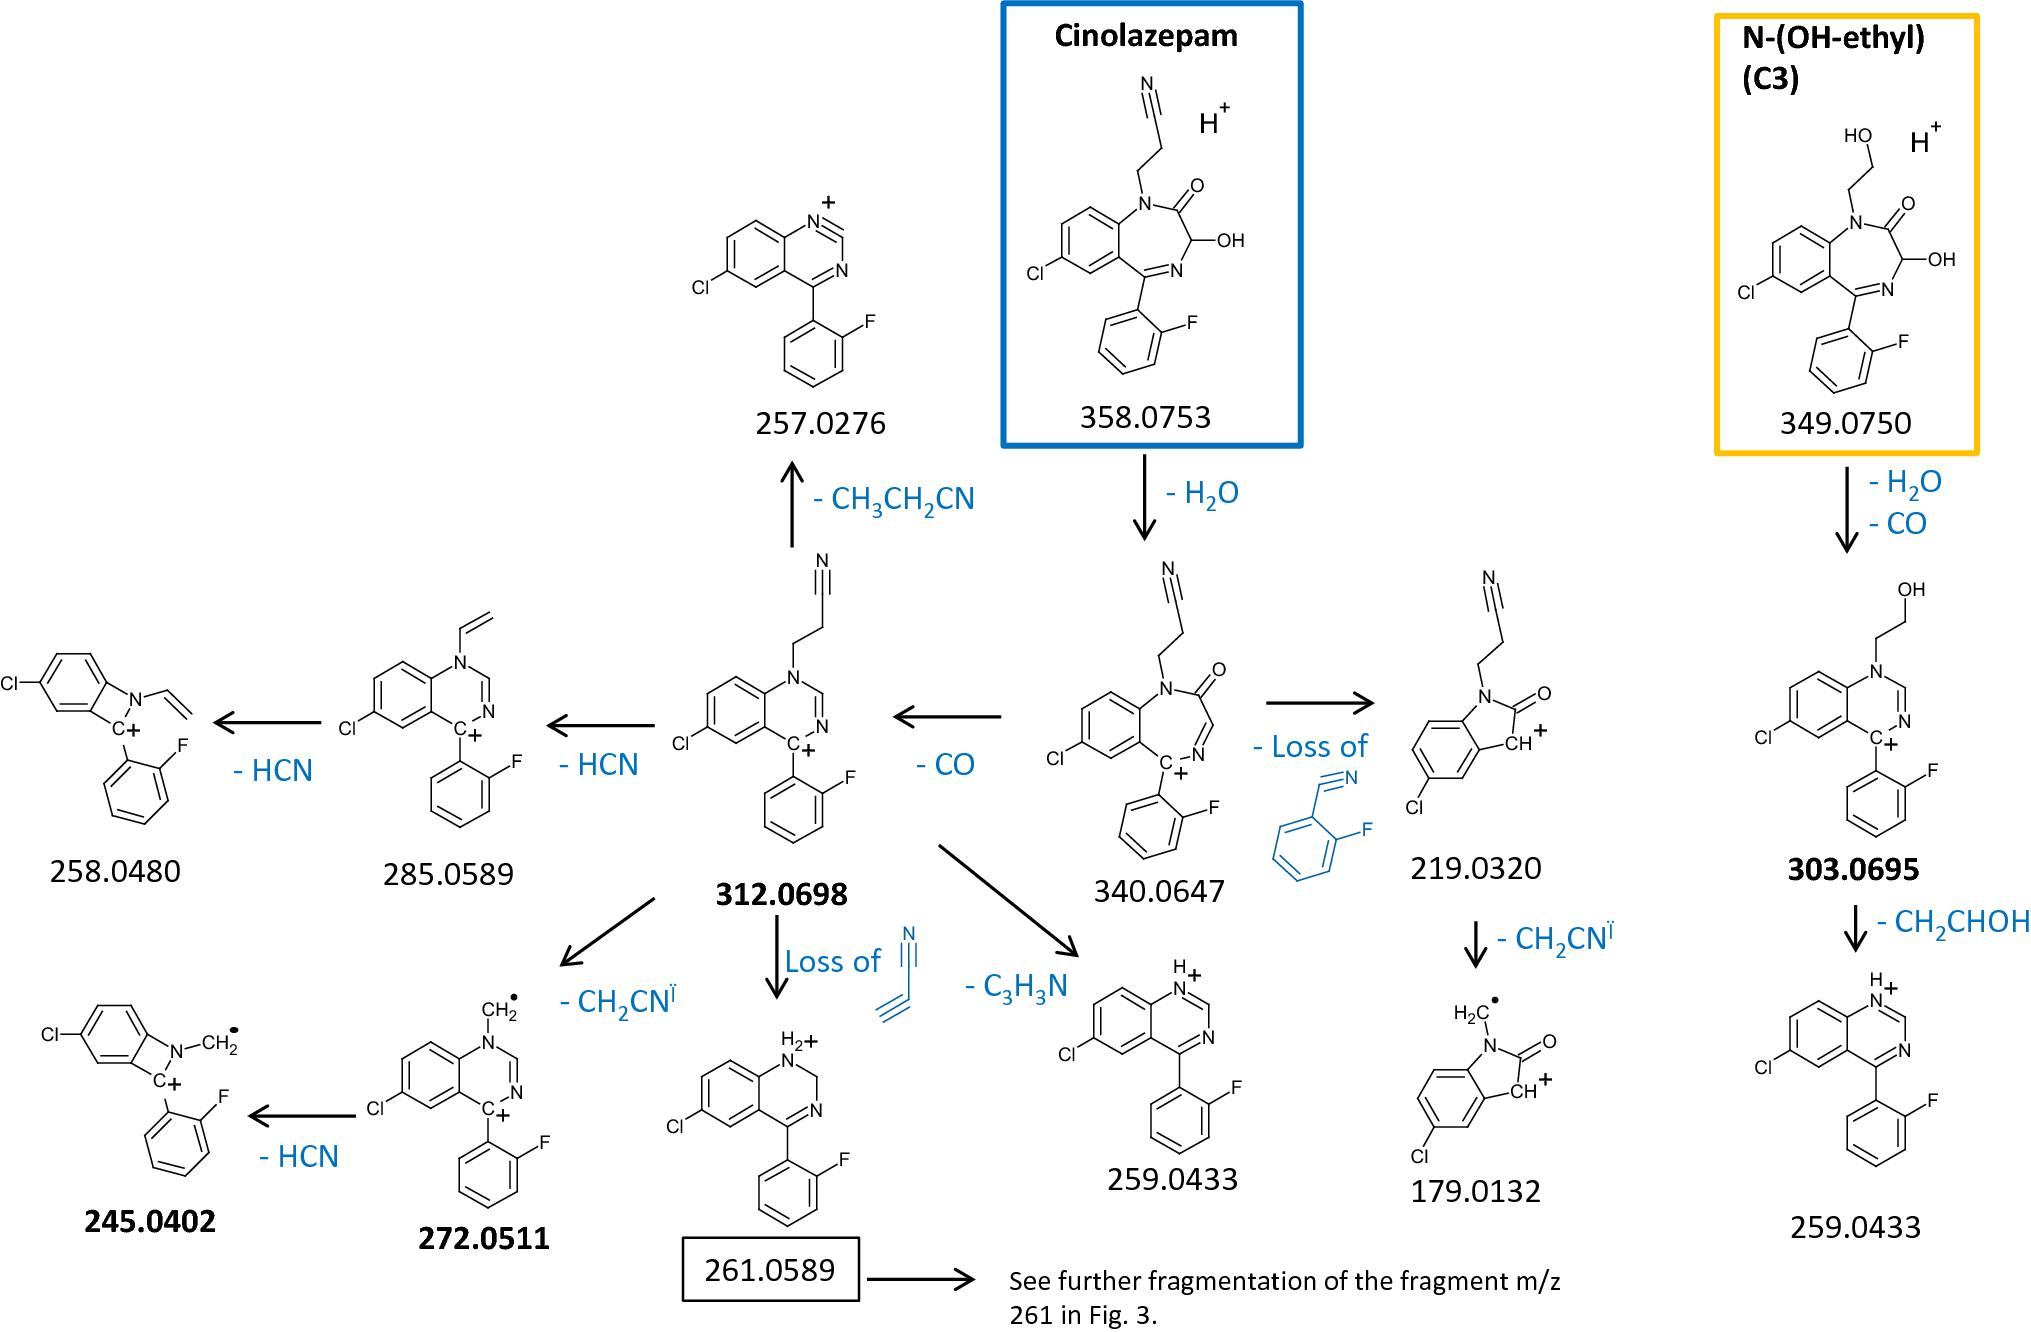 Metabolism of the benzodiazepines norflurazepam, flurazepam